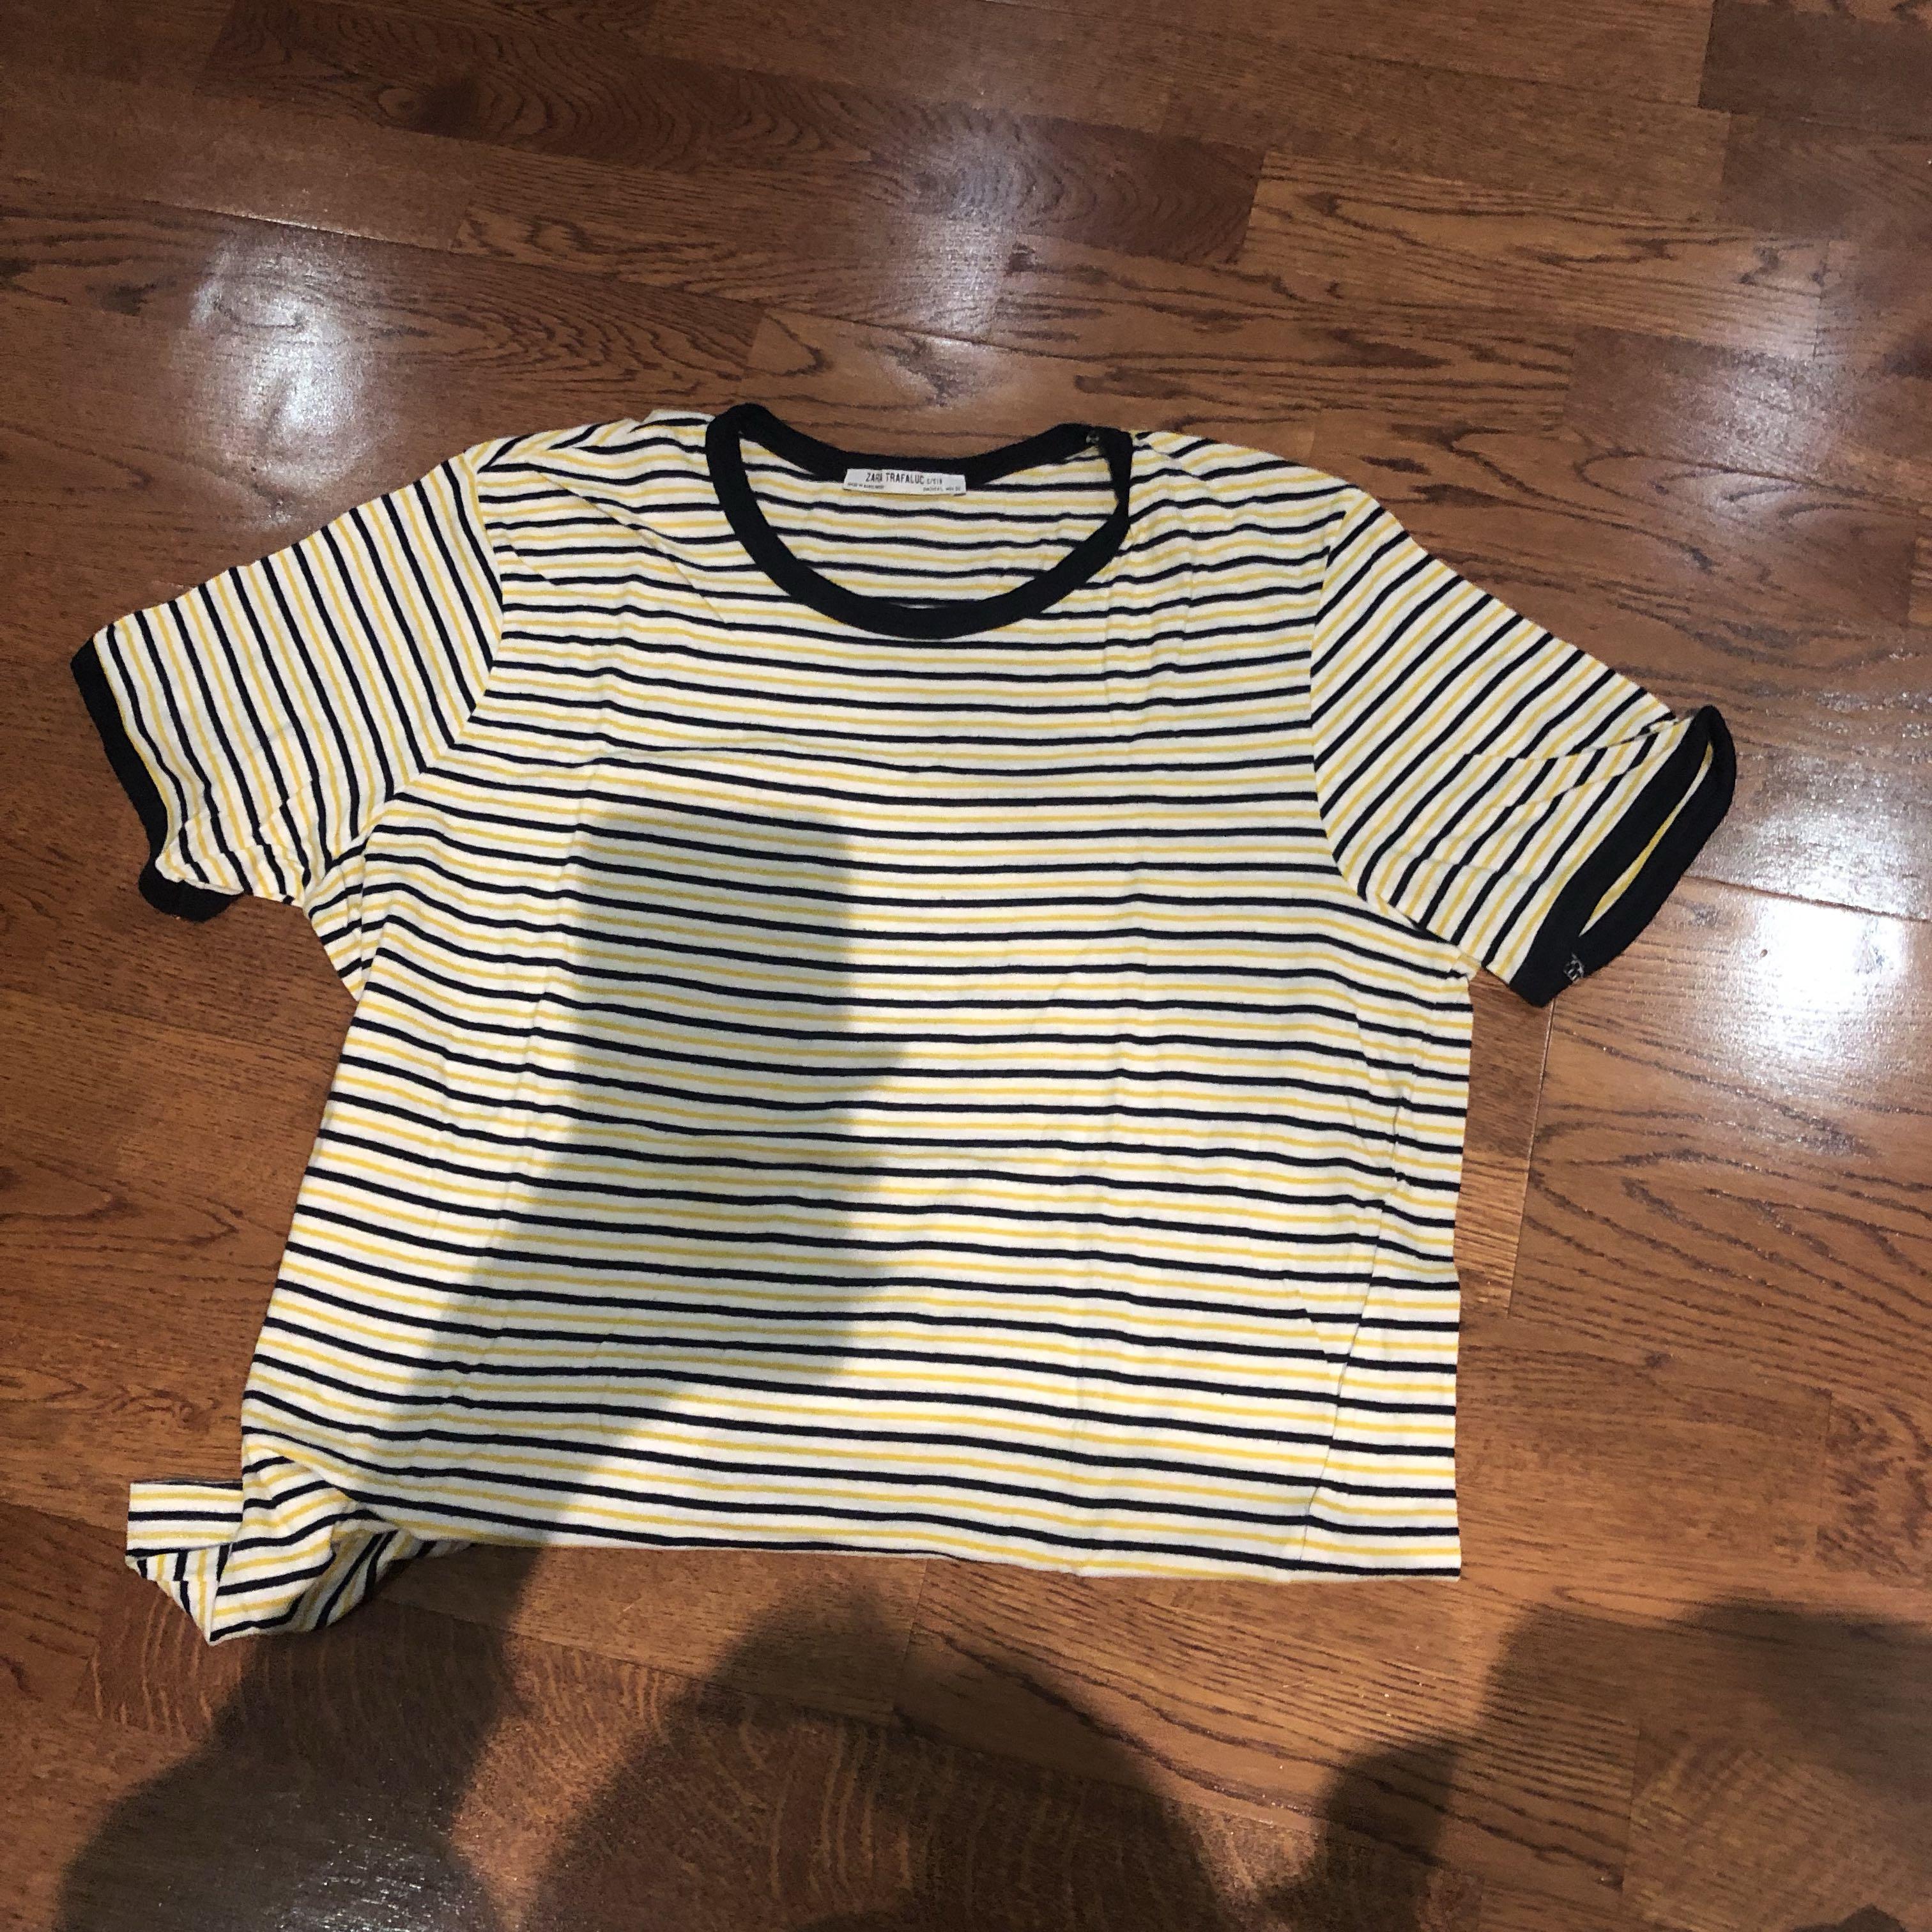 Zara Stripes Tee